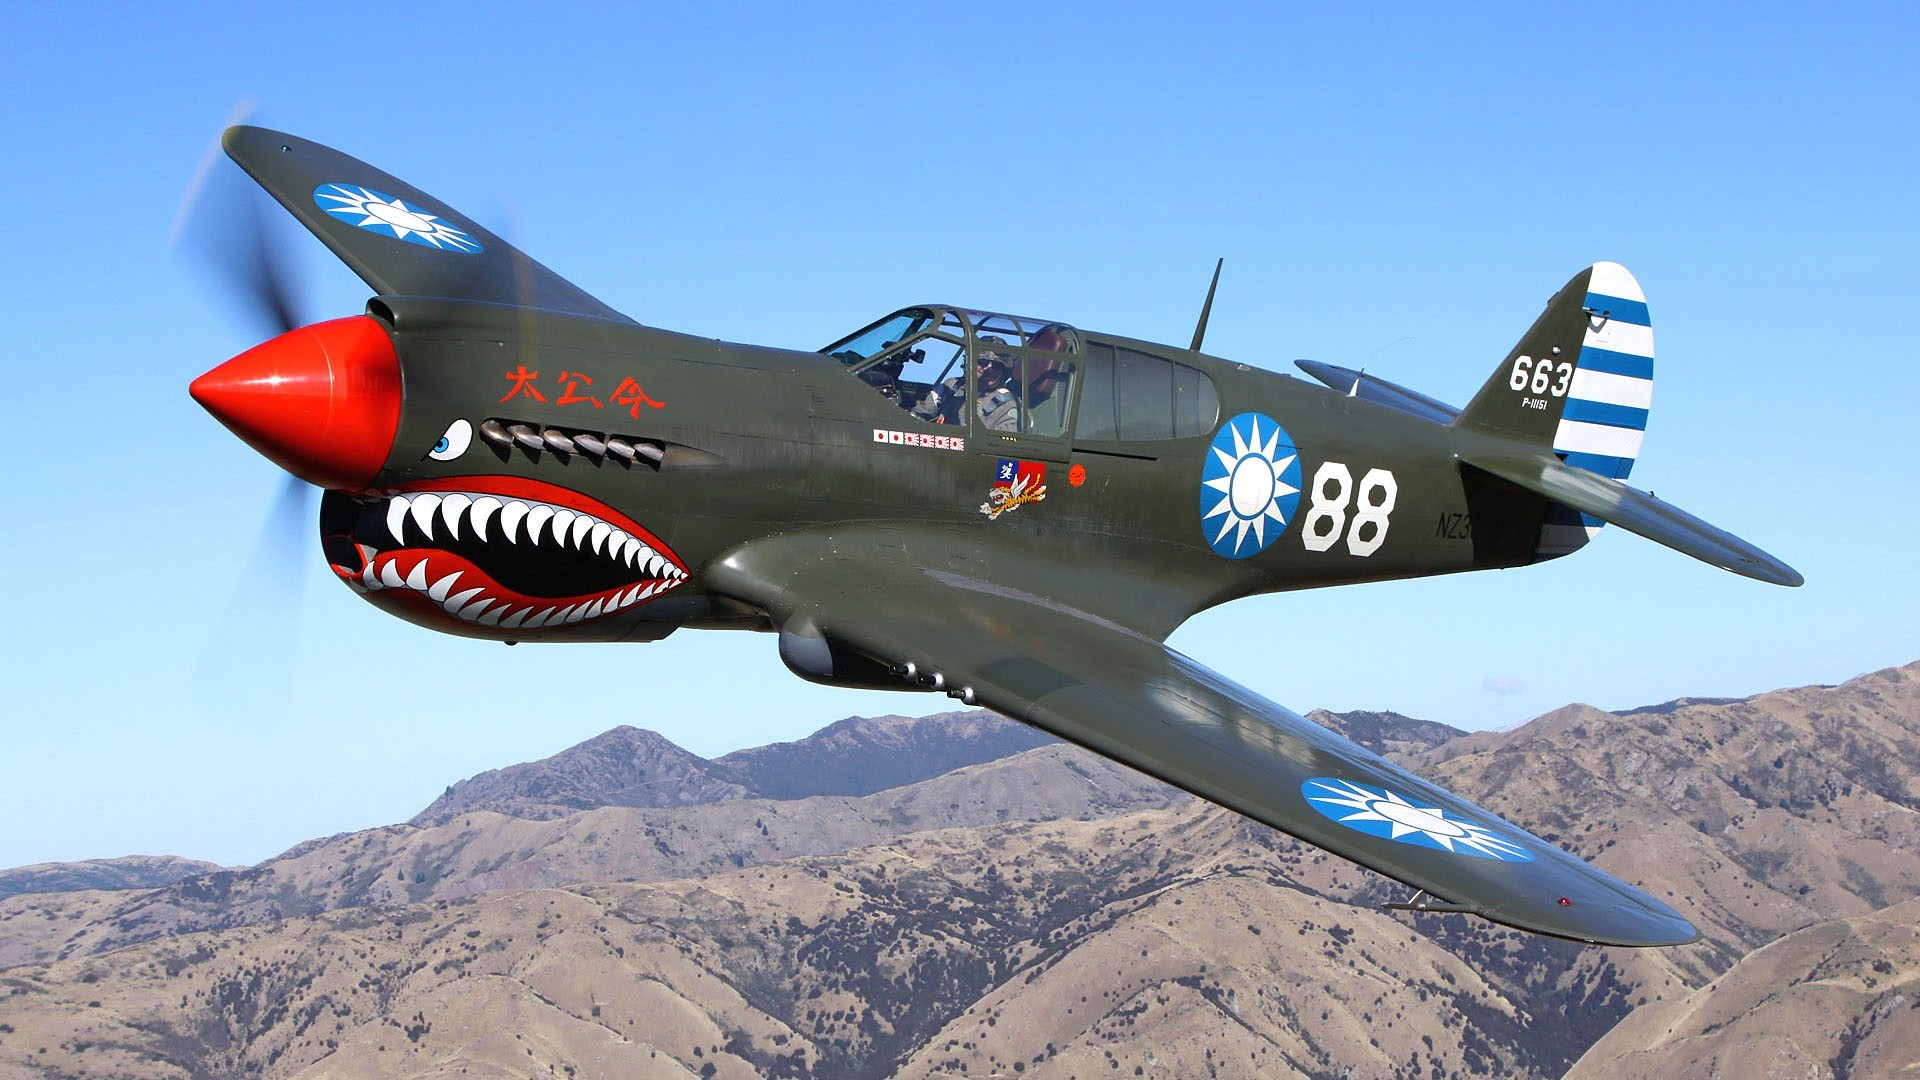 War Planes Ww2 Wallpaper